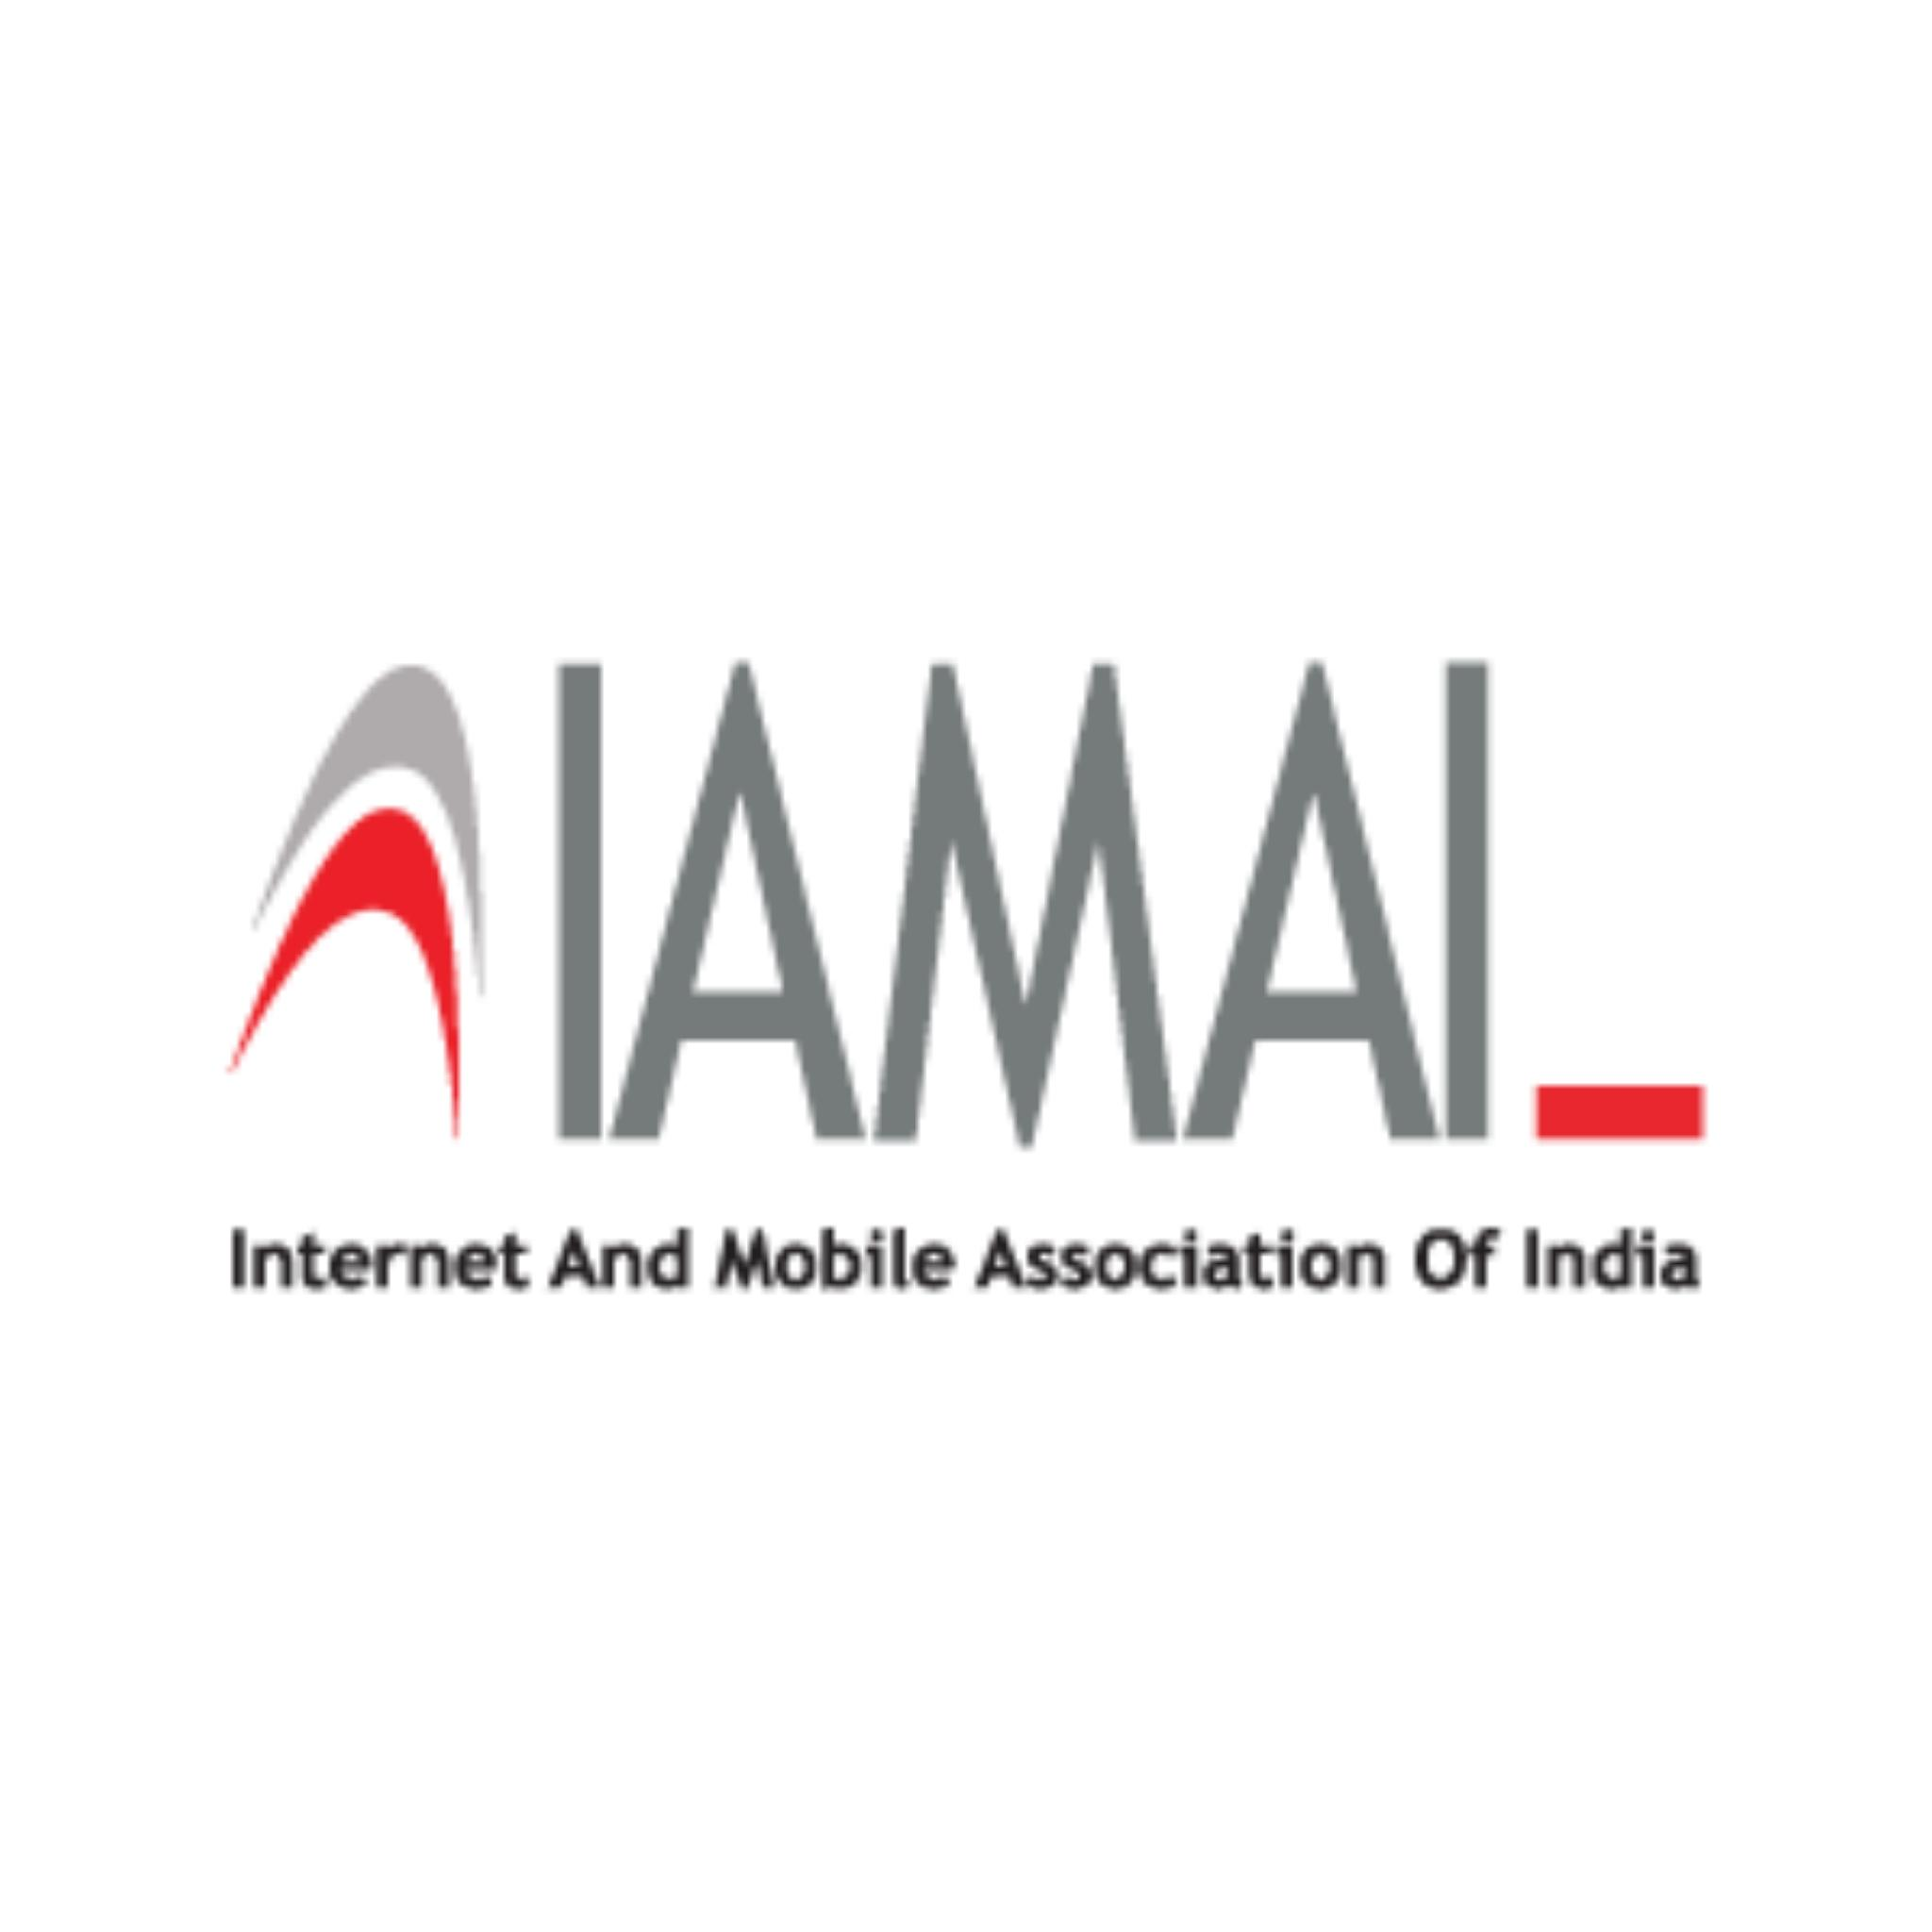 https://www.indiantelevision.com/sites/default/files/styles/smartcrop_800x800/public/images/tv-images/2021/08/26/photogrid_plus_1629975215893.jpg?itok=aH_v-ItK